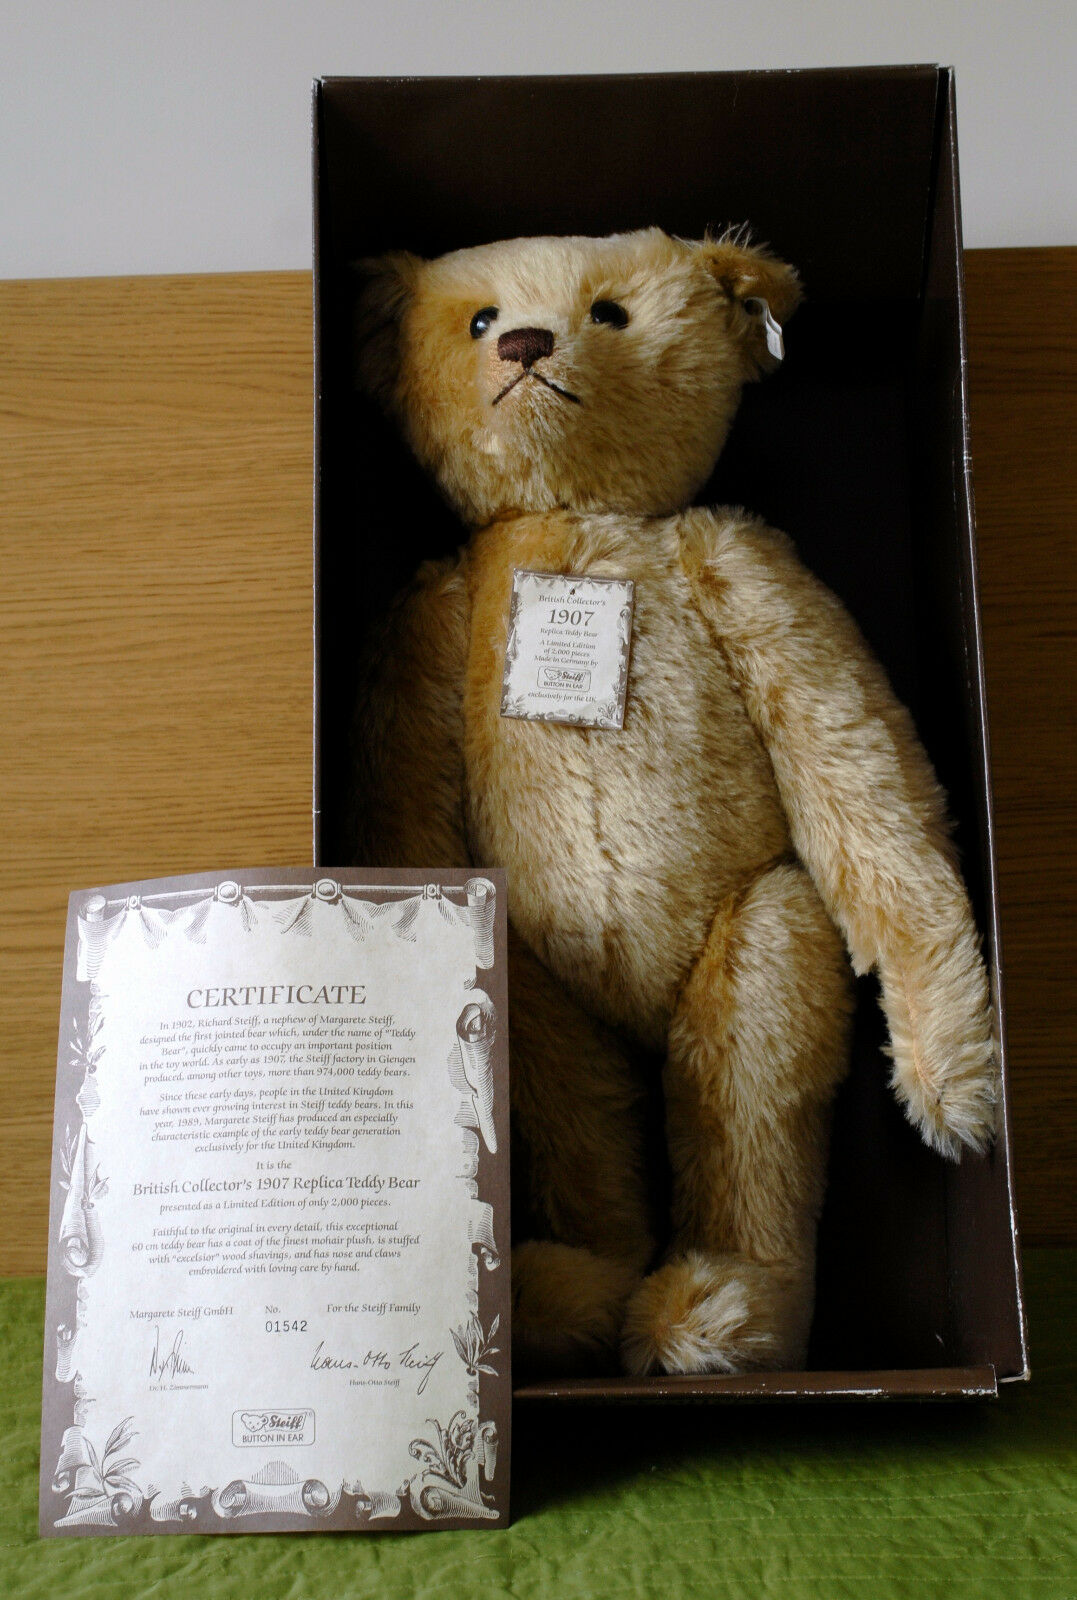 Steiff 1989 1989 1989 EAN 0174 61 British Collector's Replica Teddy Bear 1907 LE 2000 60cm fc7717